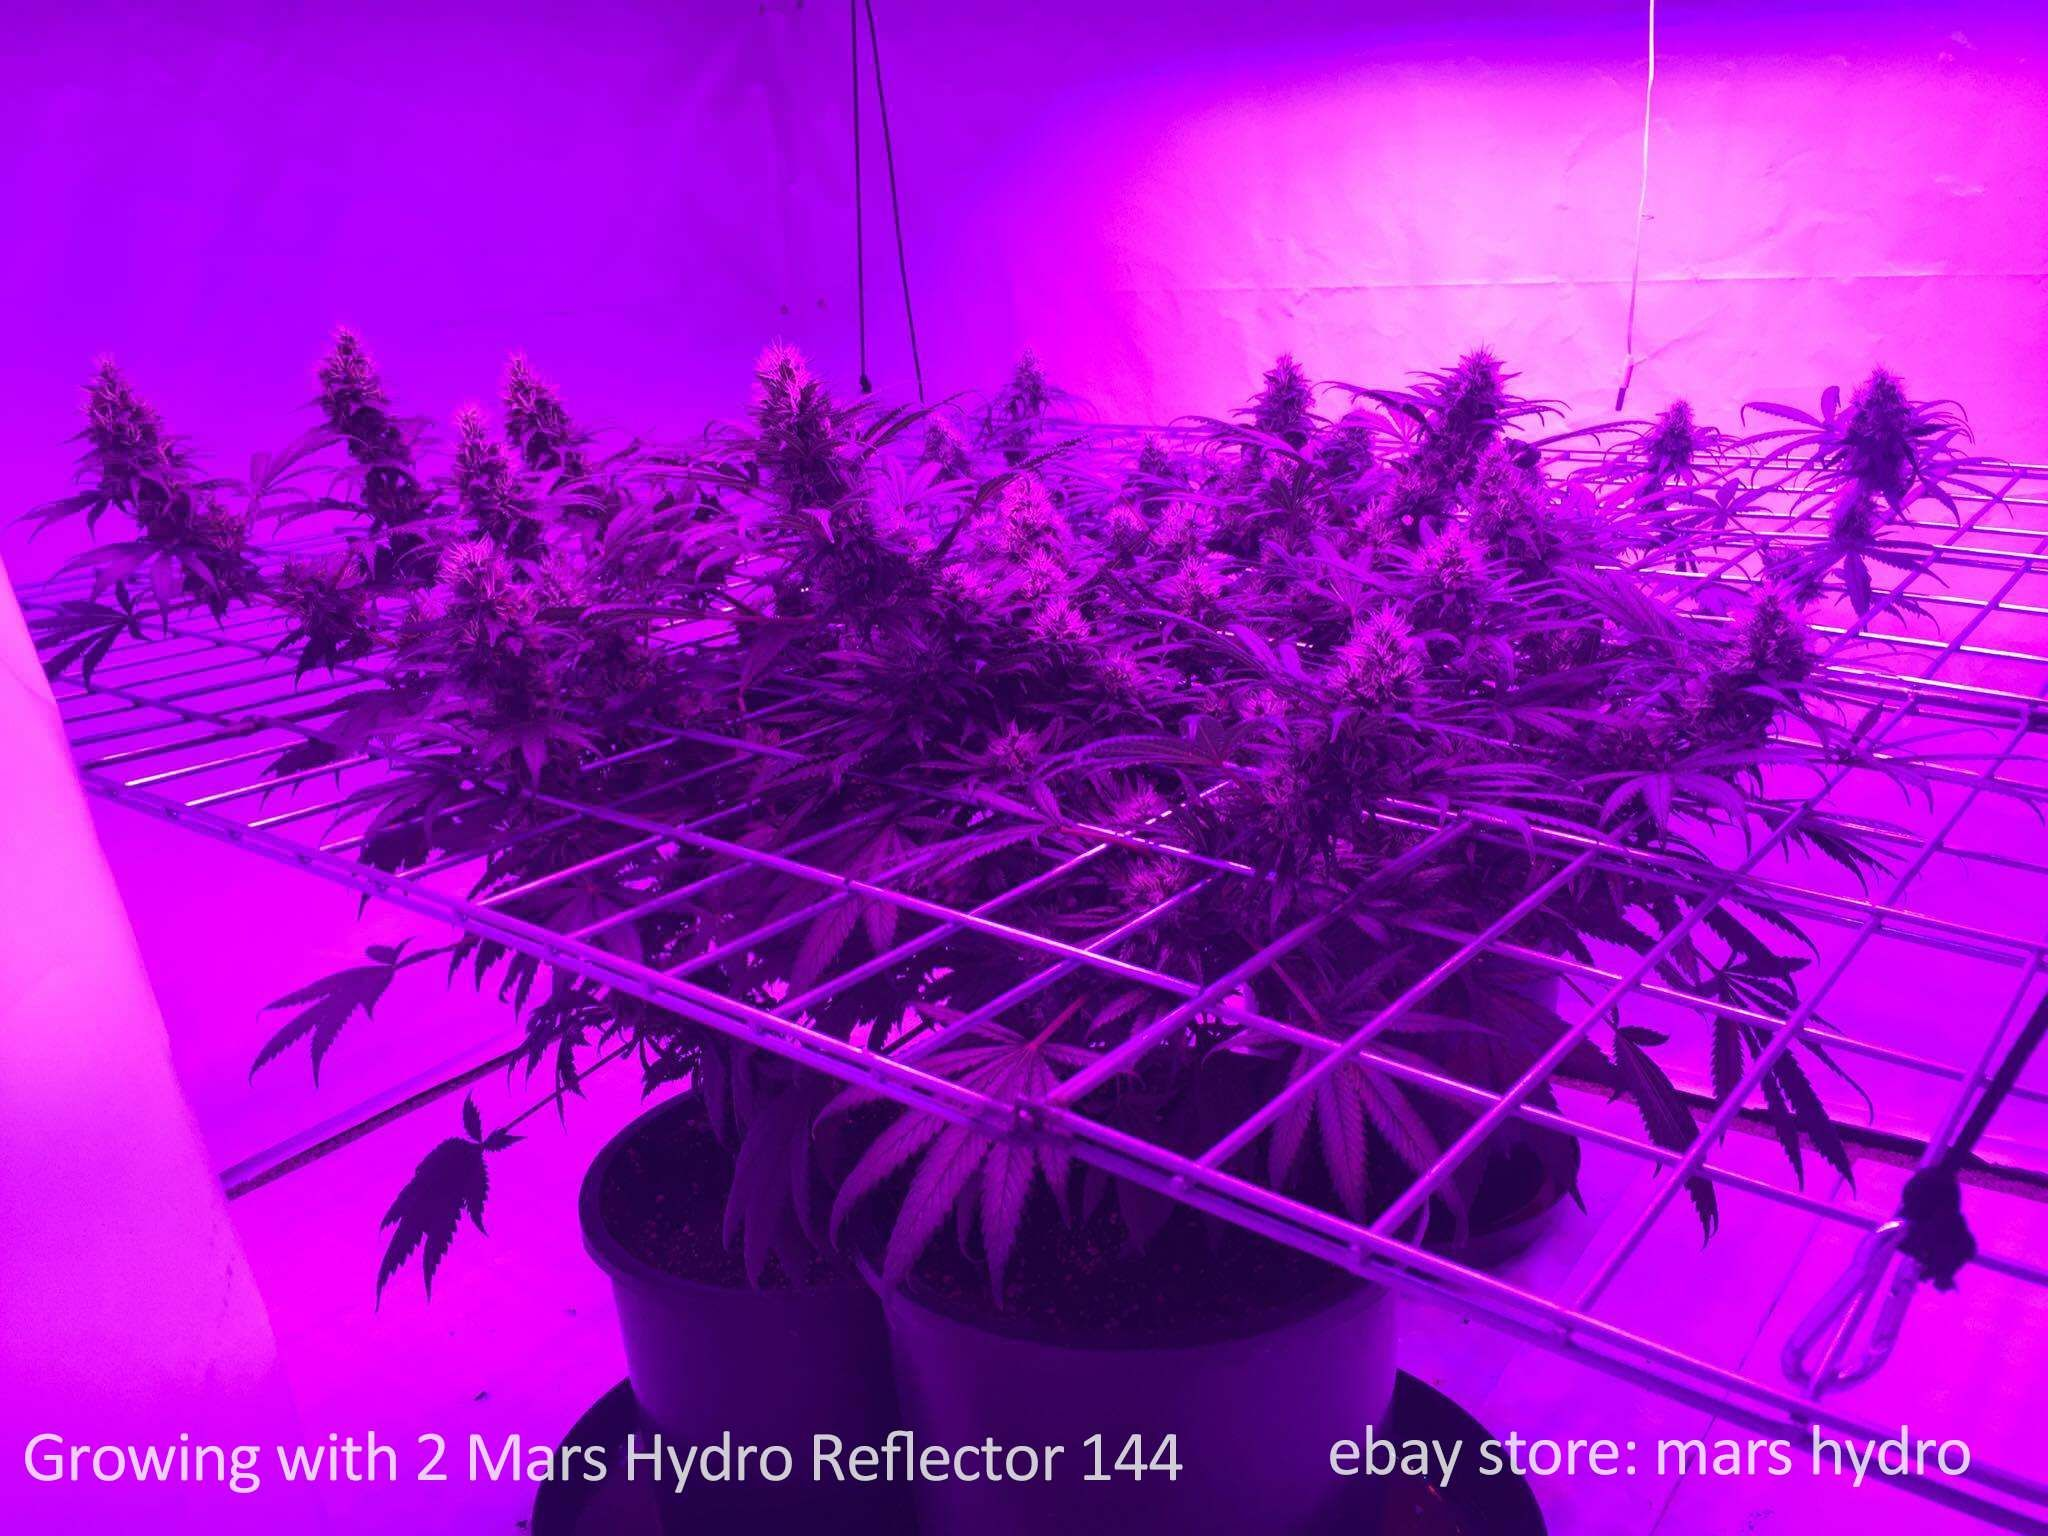 Growing Cannabis With 2 Mars Hydro Reflector 144 LED Grow Lights Panel Lamp  Indoor High Yield